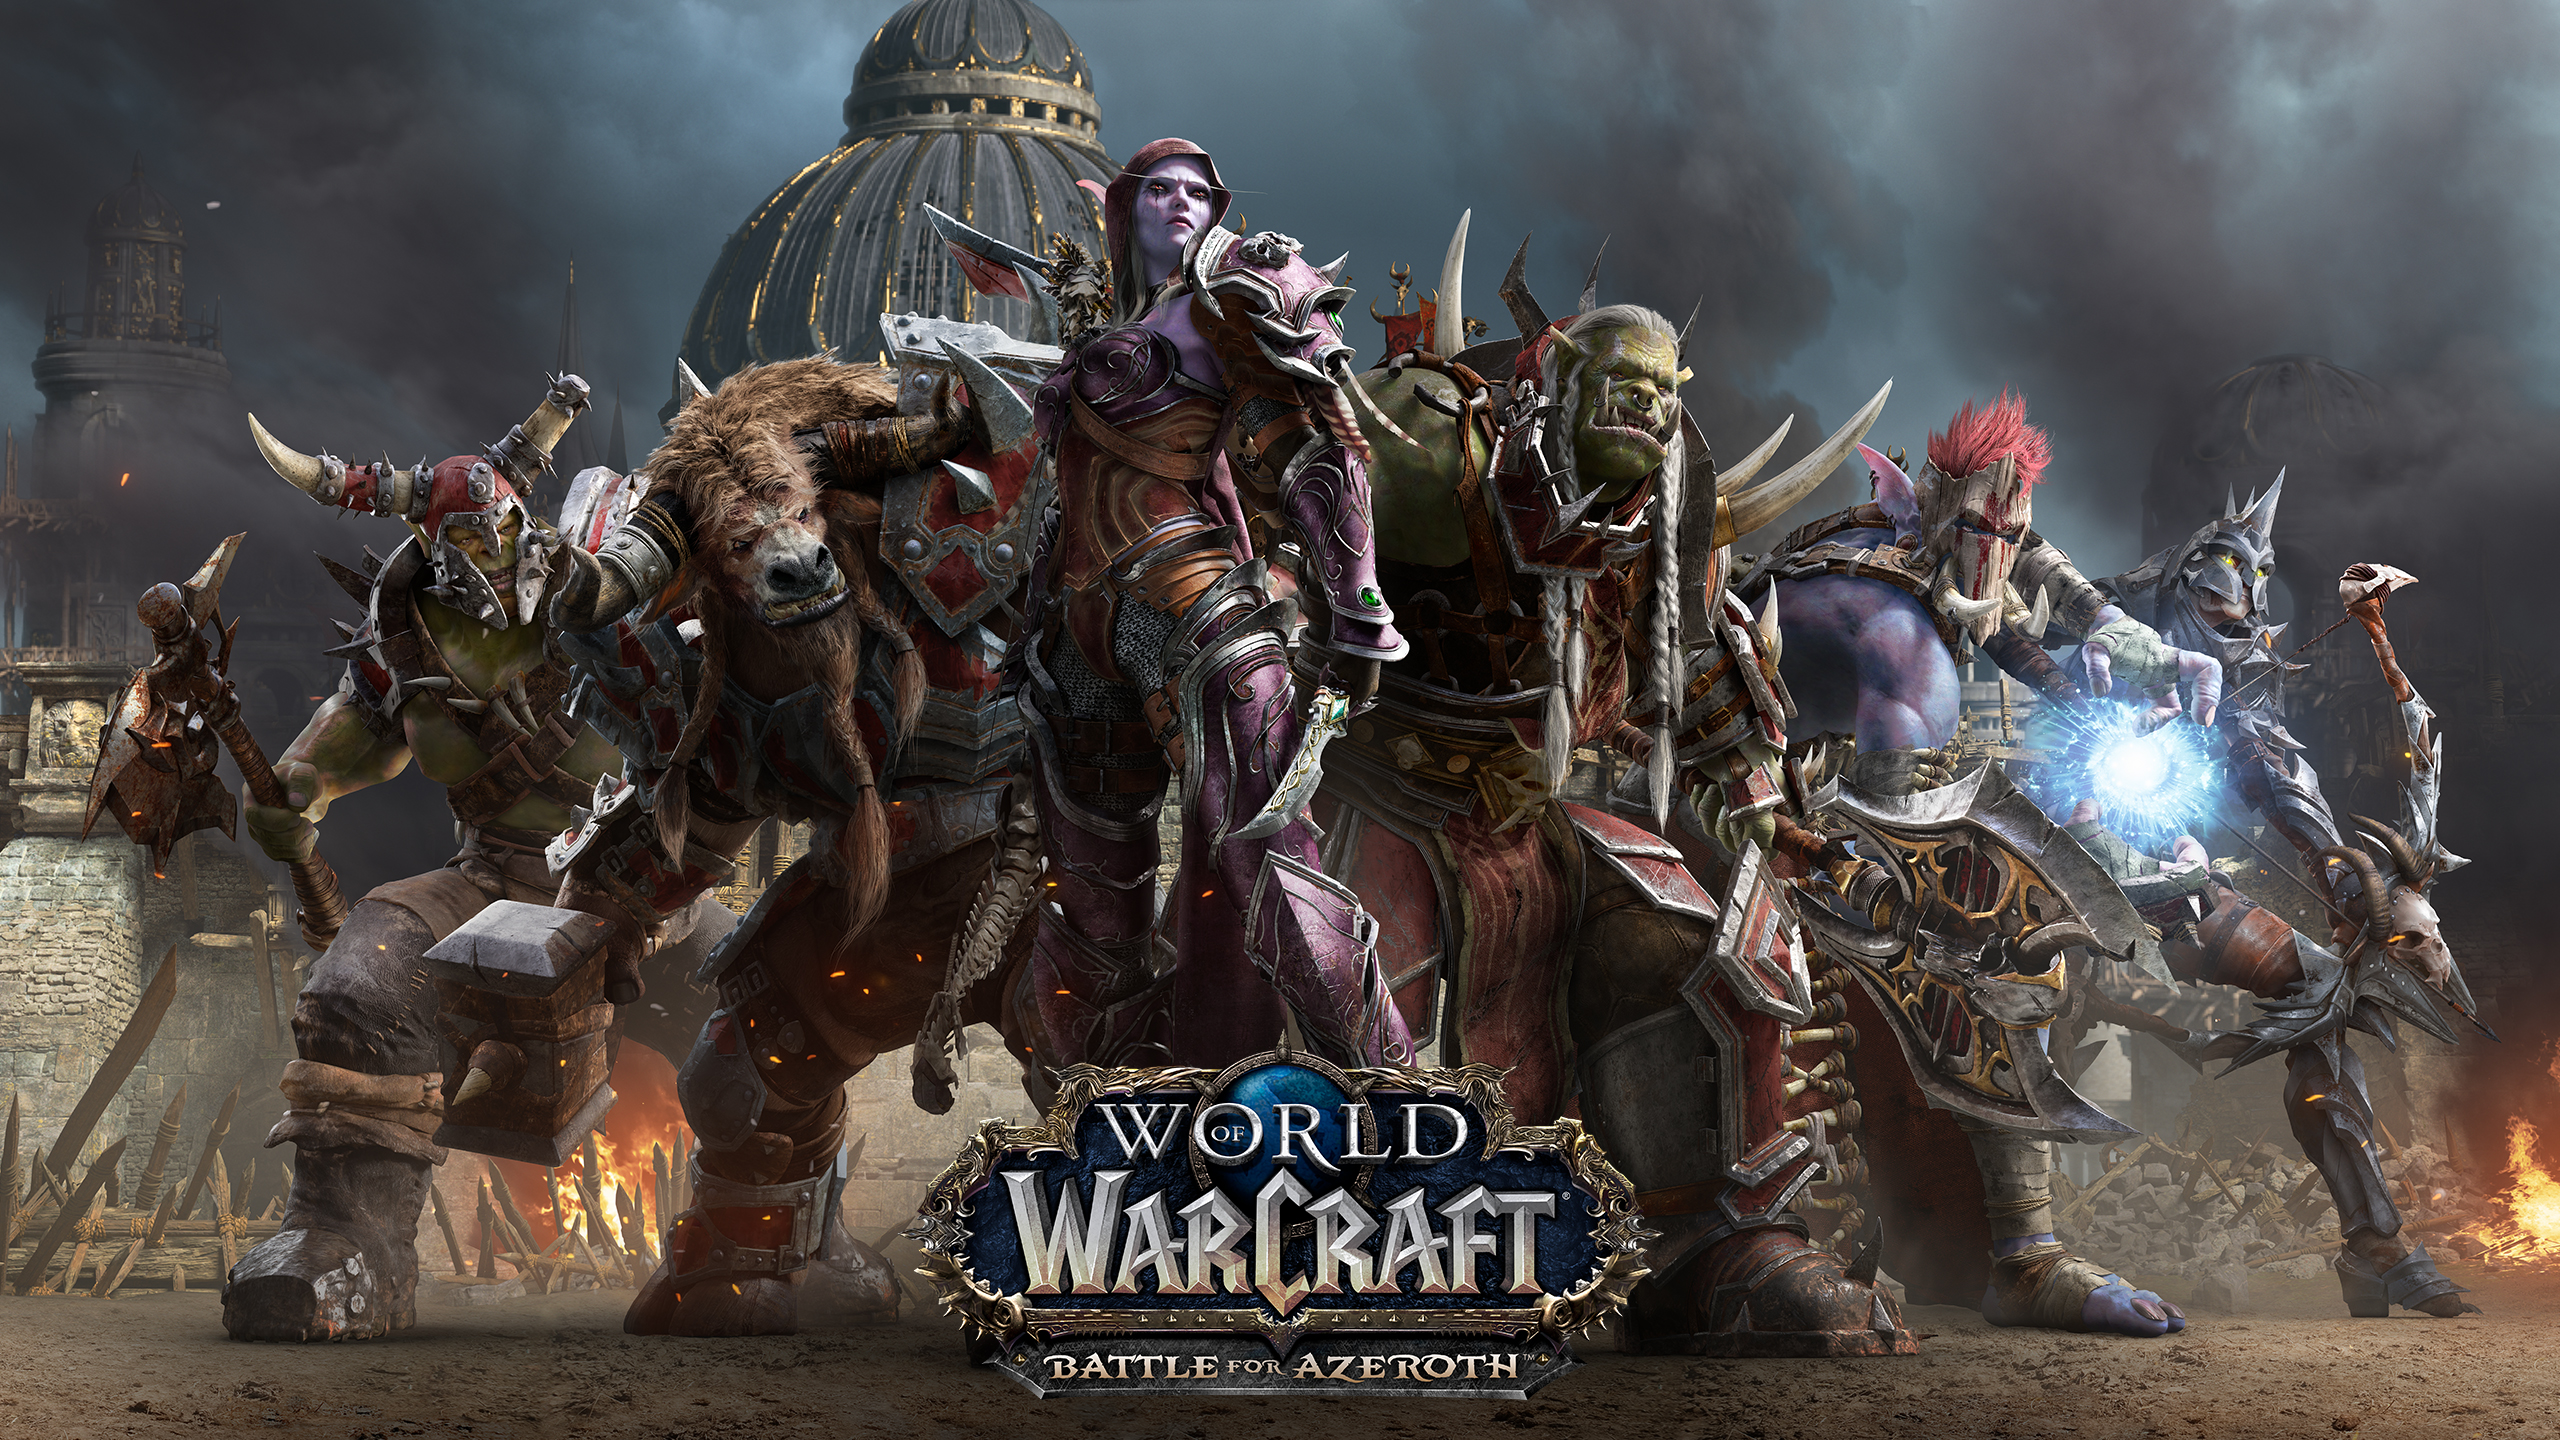 World of Warcraft uses DirectX 12 running on Windows 7 | DirectX